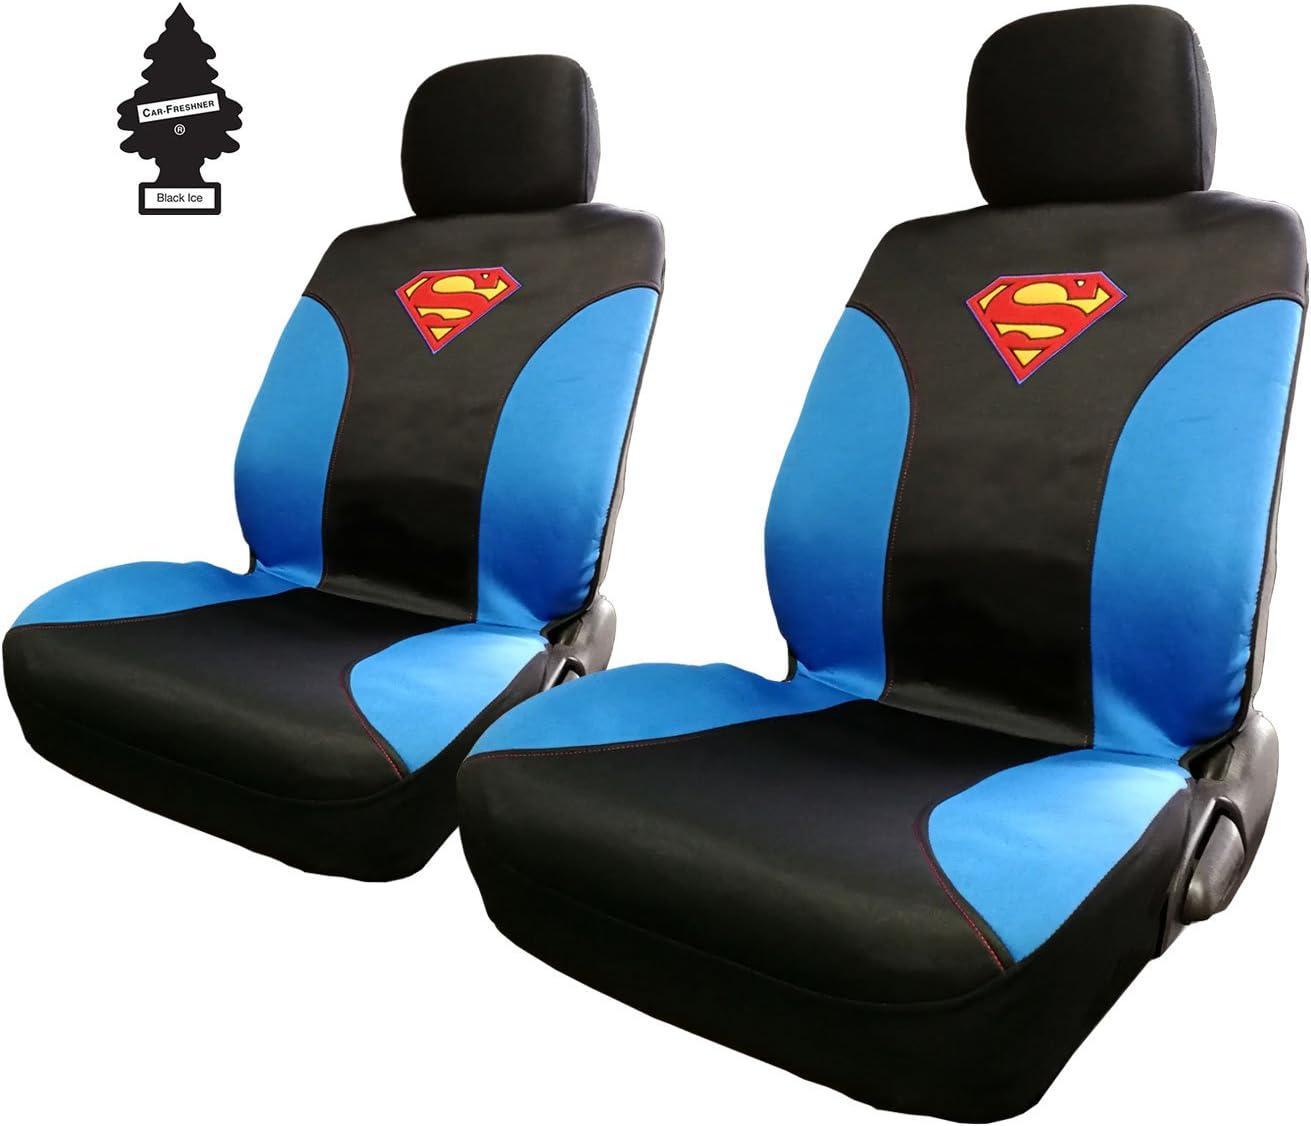 Yupbizauto Pair of New DC Comic Superman Sideless Neoprene Waterproof Car Seat Covers with Air Freshener